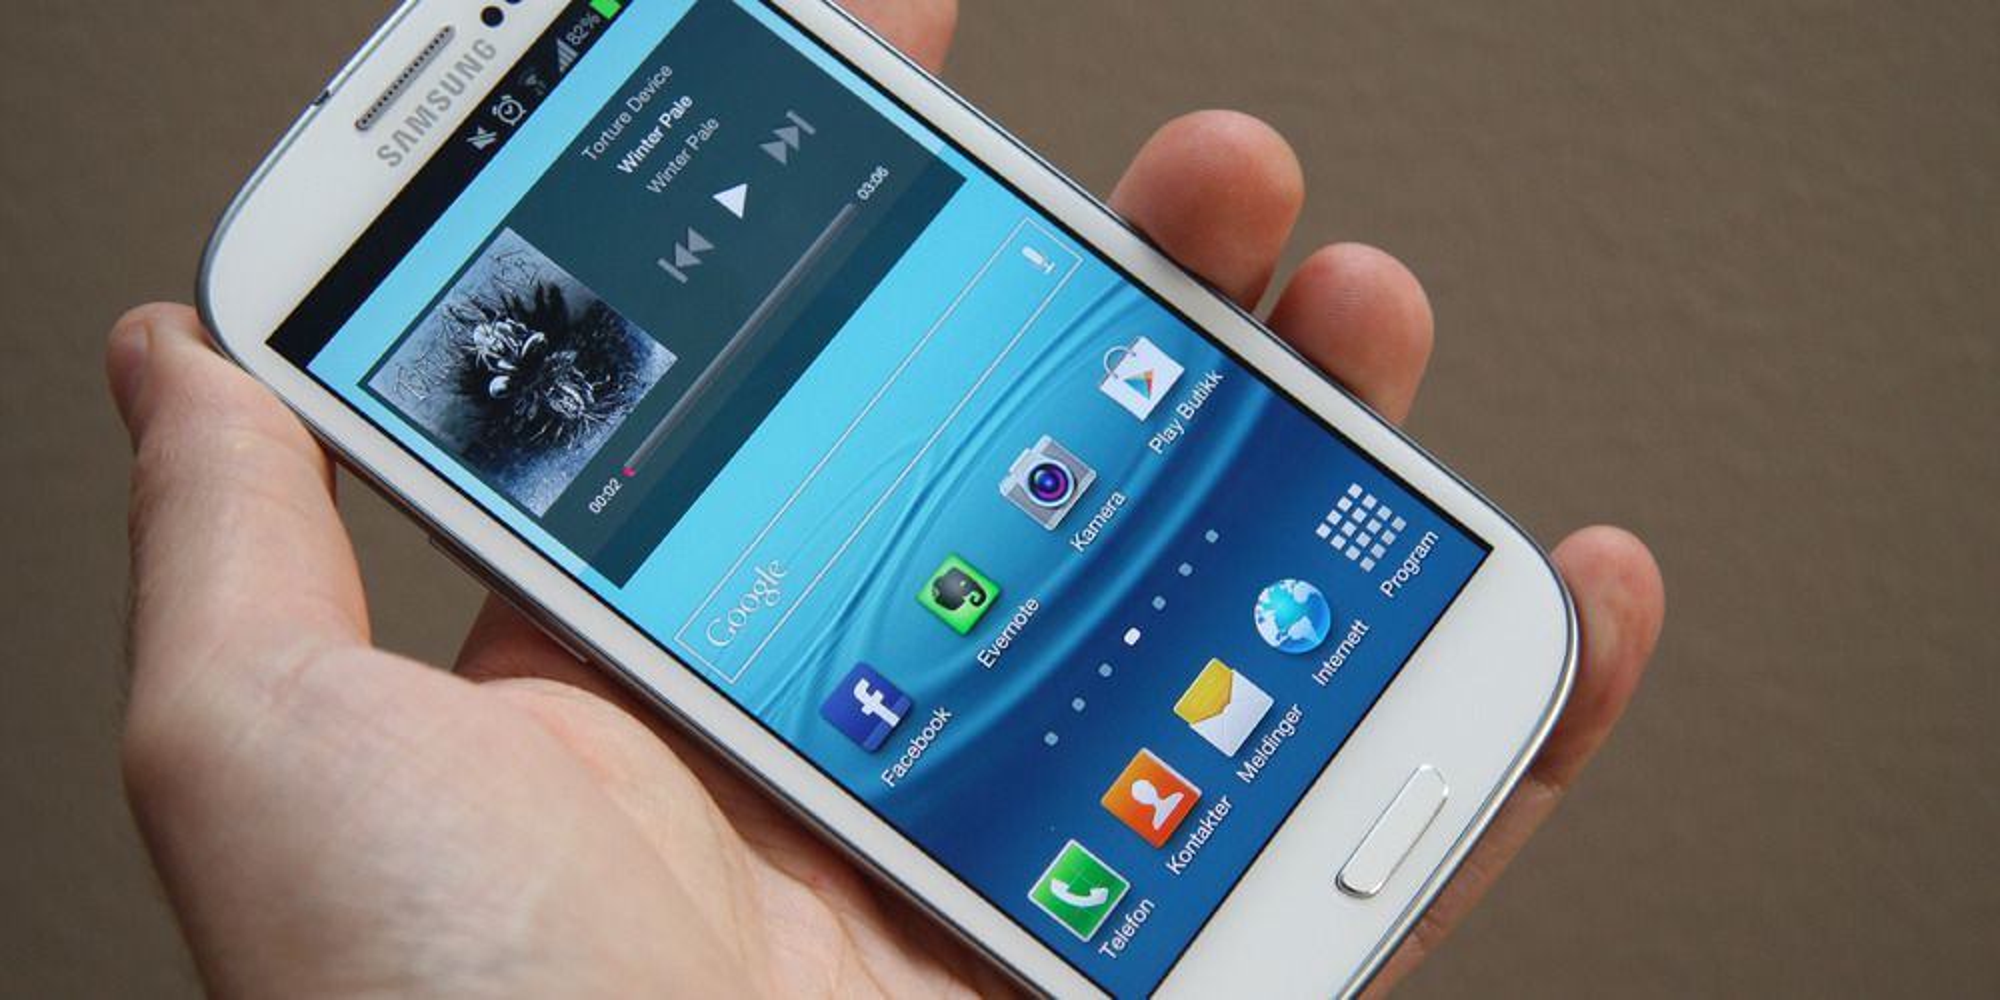 TEST: Test: Samsung Galaxy S III